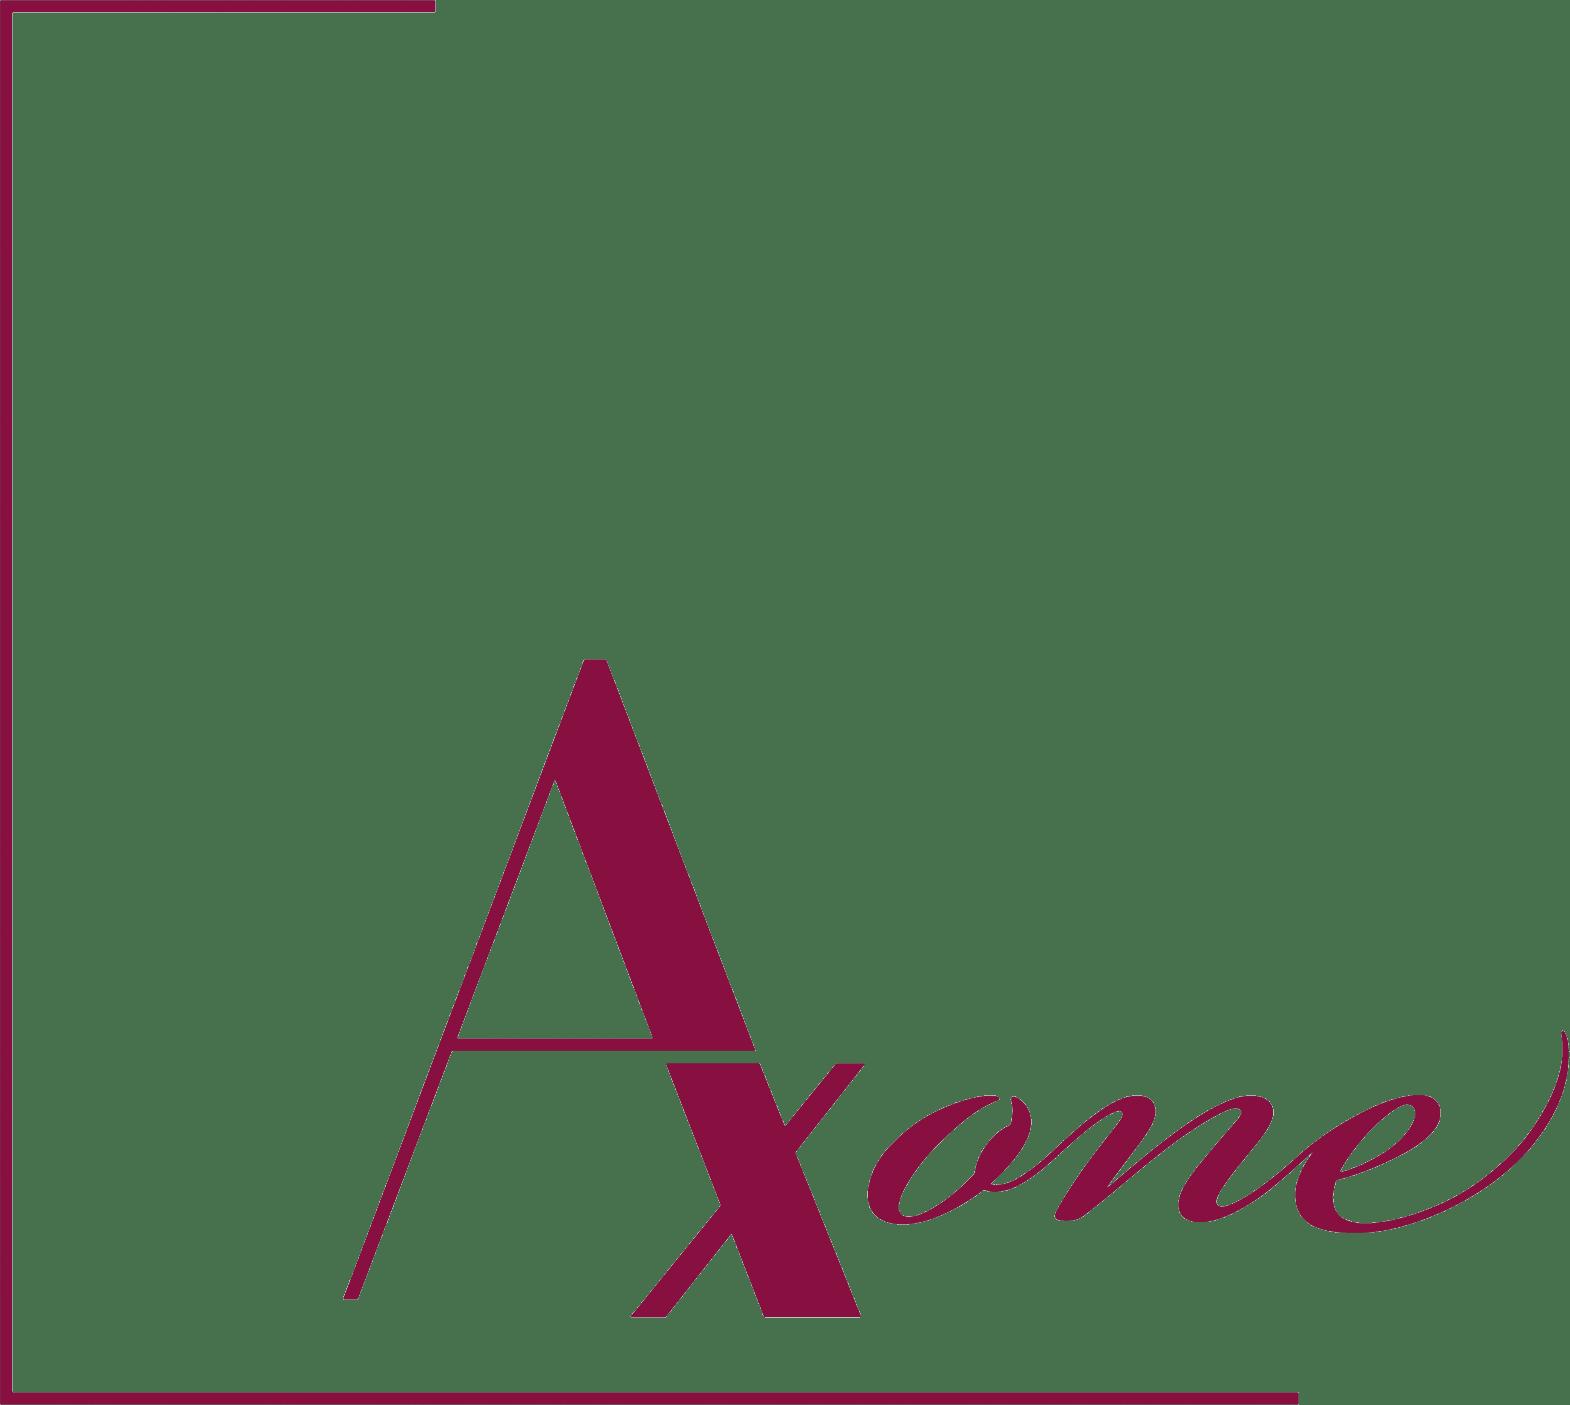 Axone Thérapies – Frédéric Hébert – Caen-Mondeville